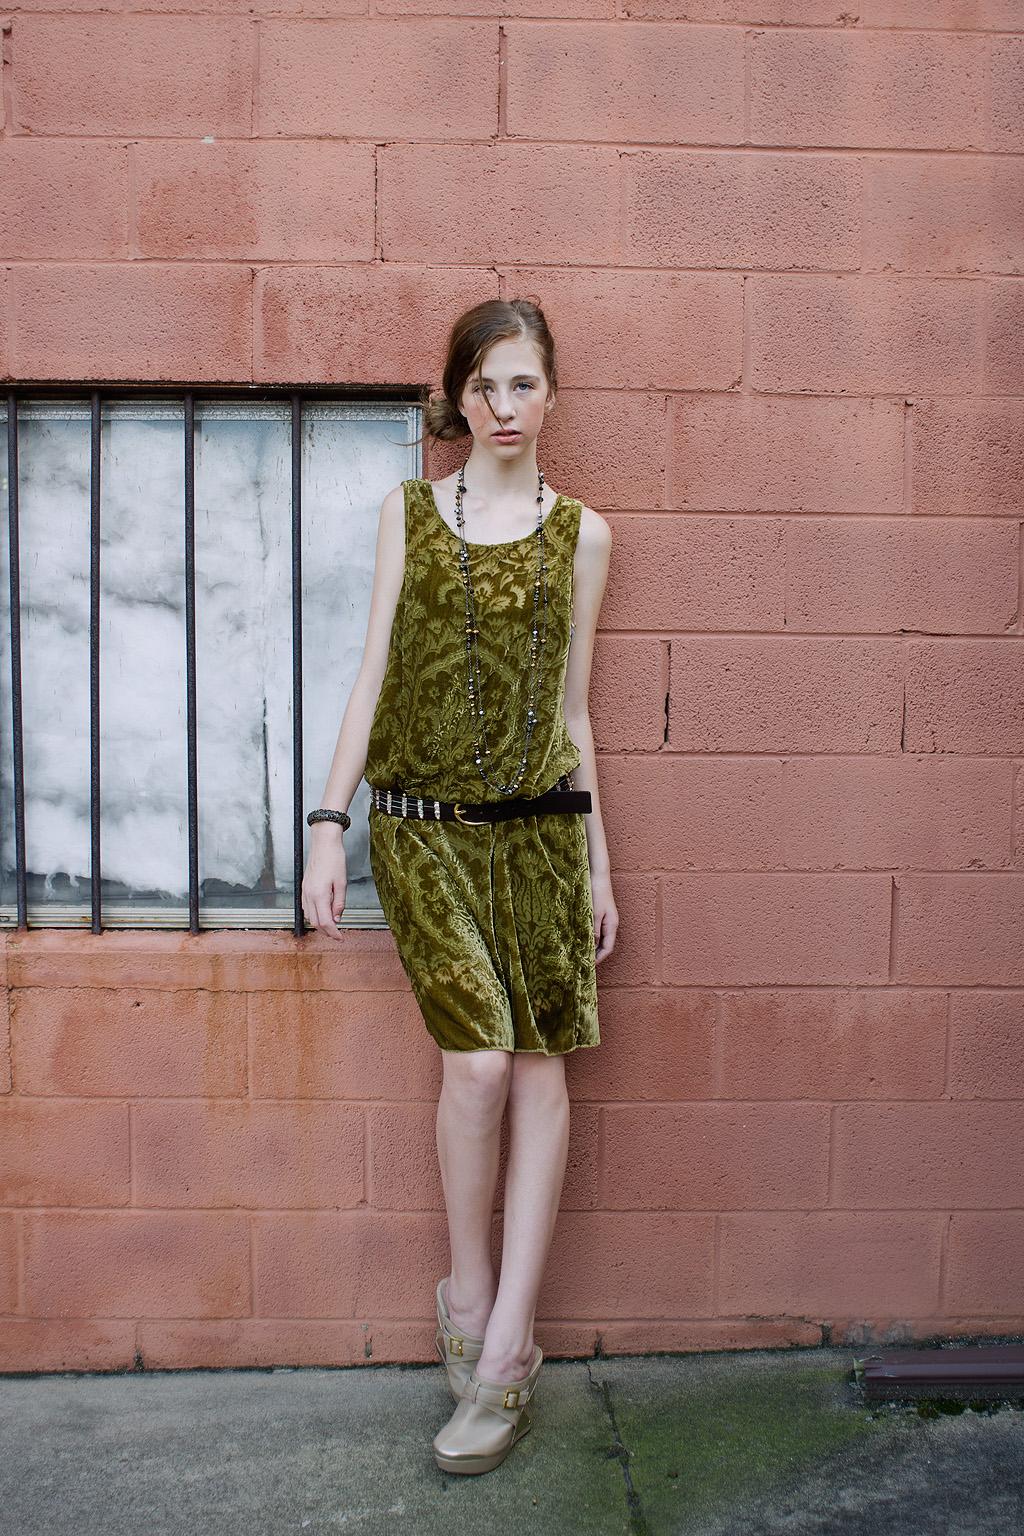 Maelyn Green Dress Full length_Cece_web.jpg